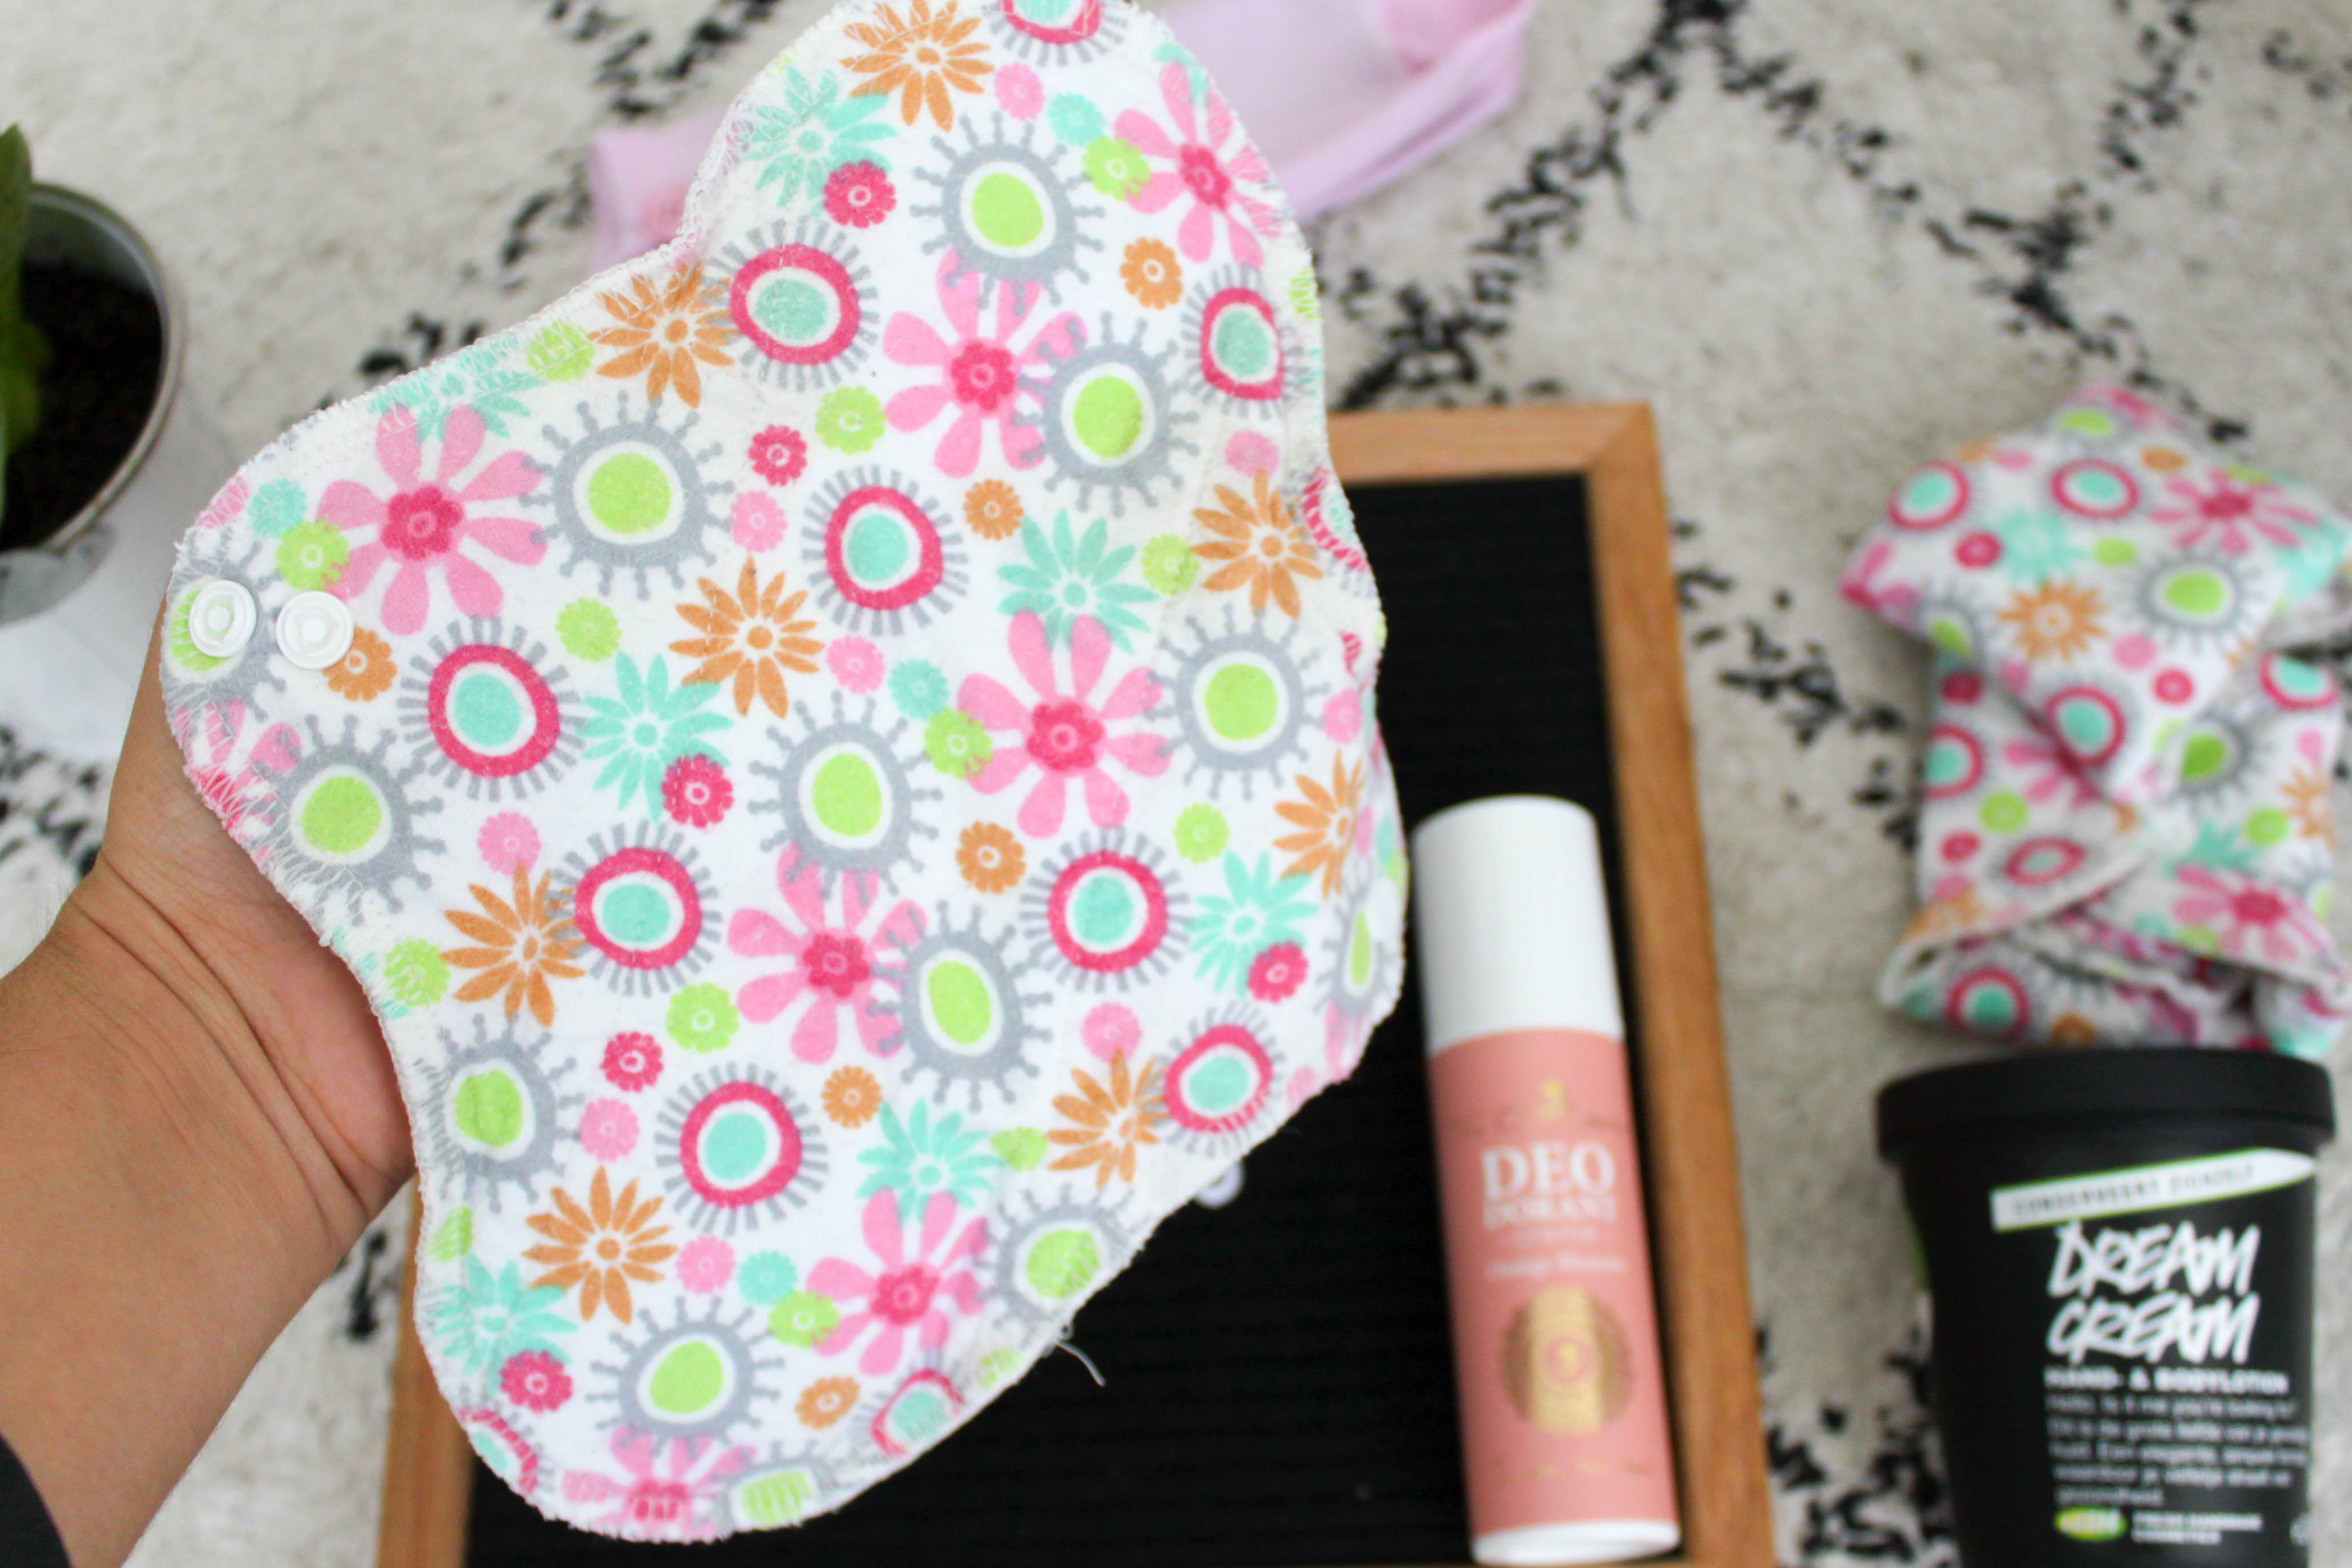 Washable cloth pads